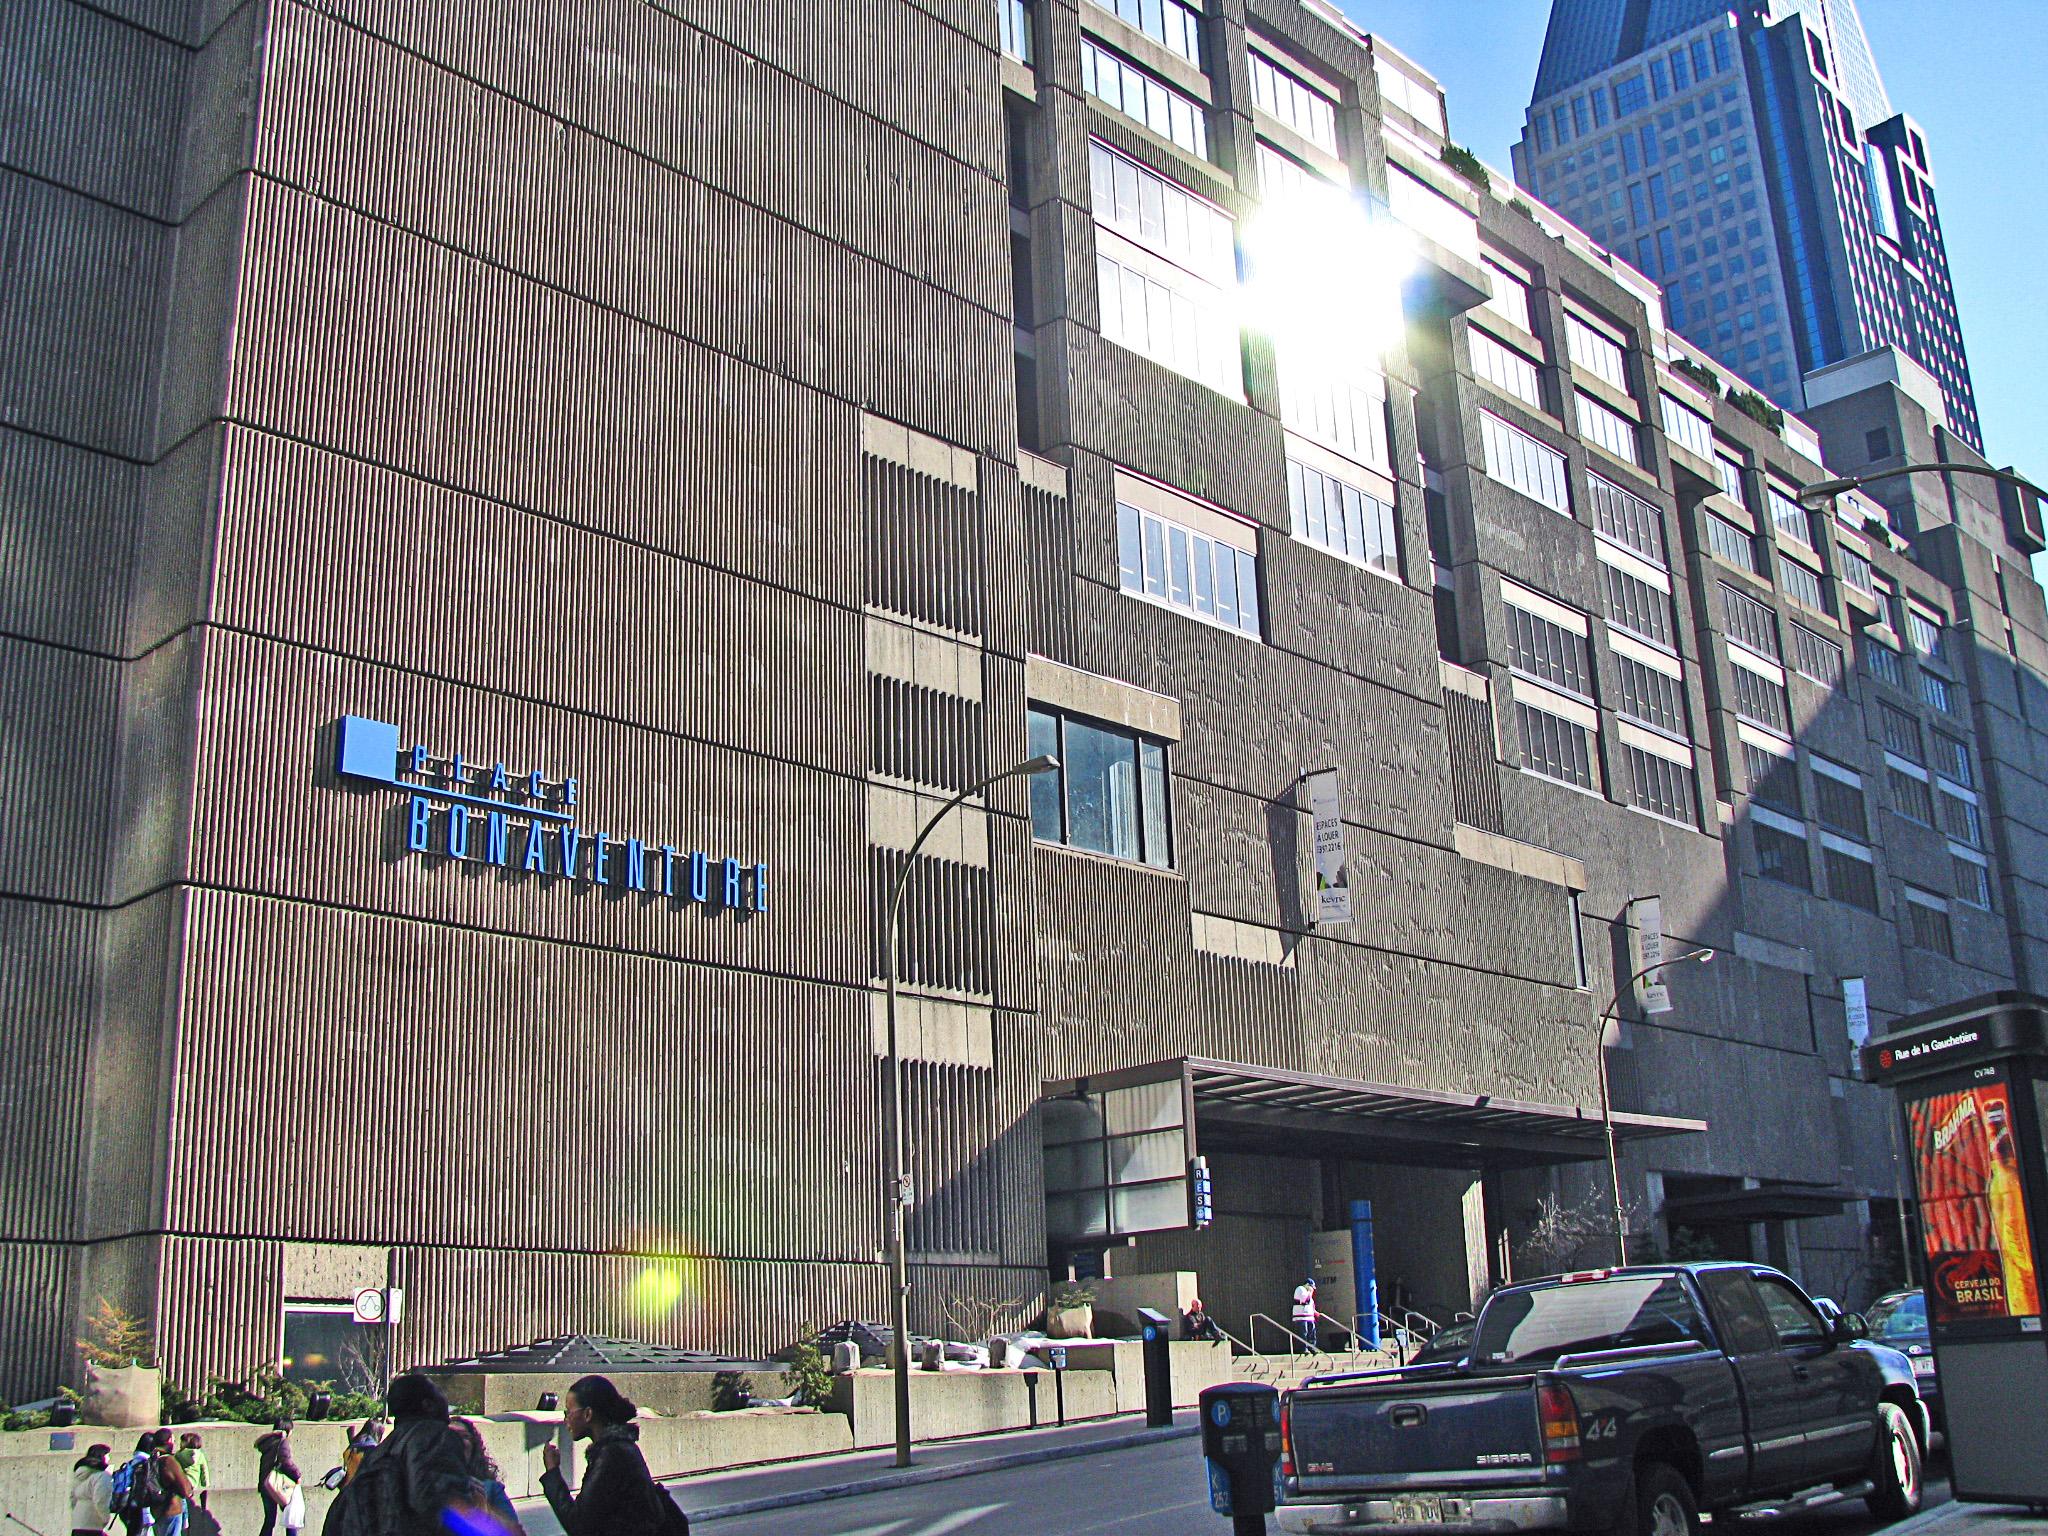 Hotel Dauphin Montreal